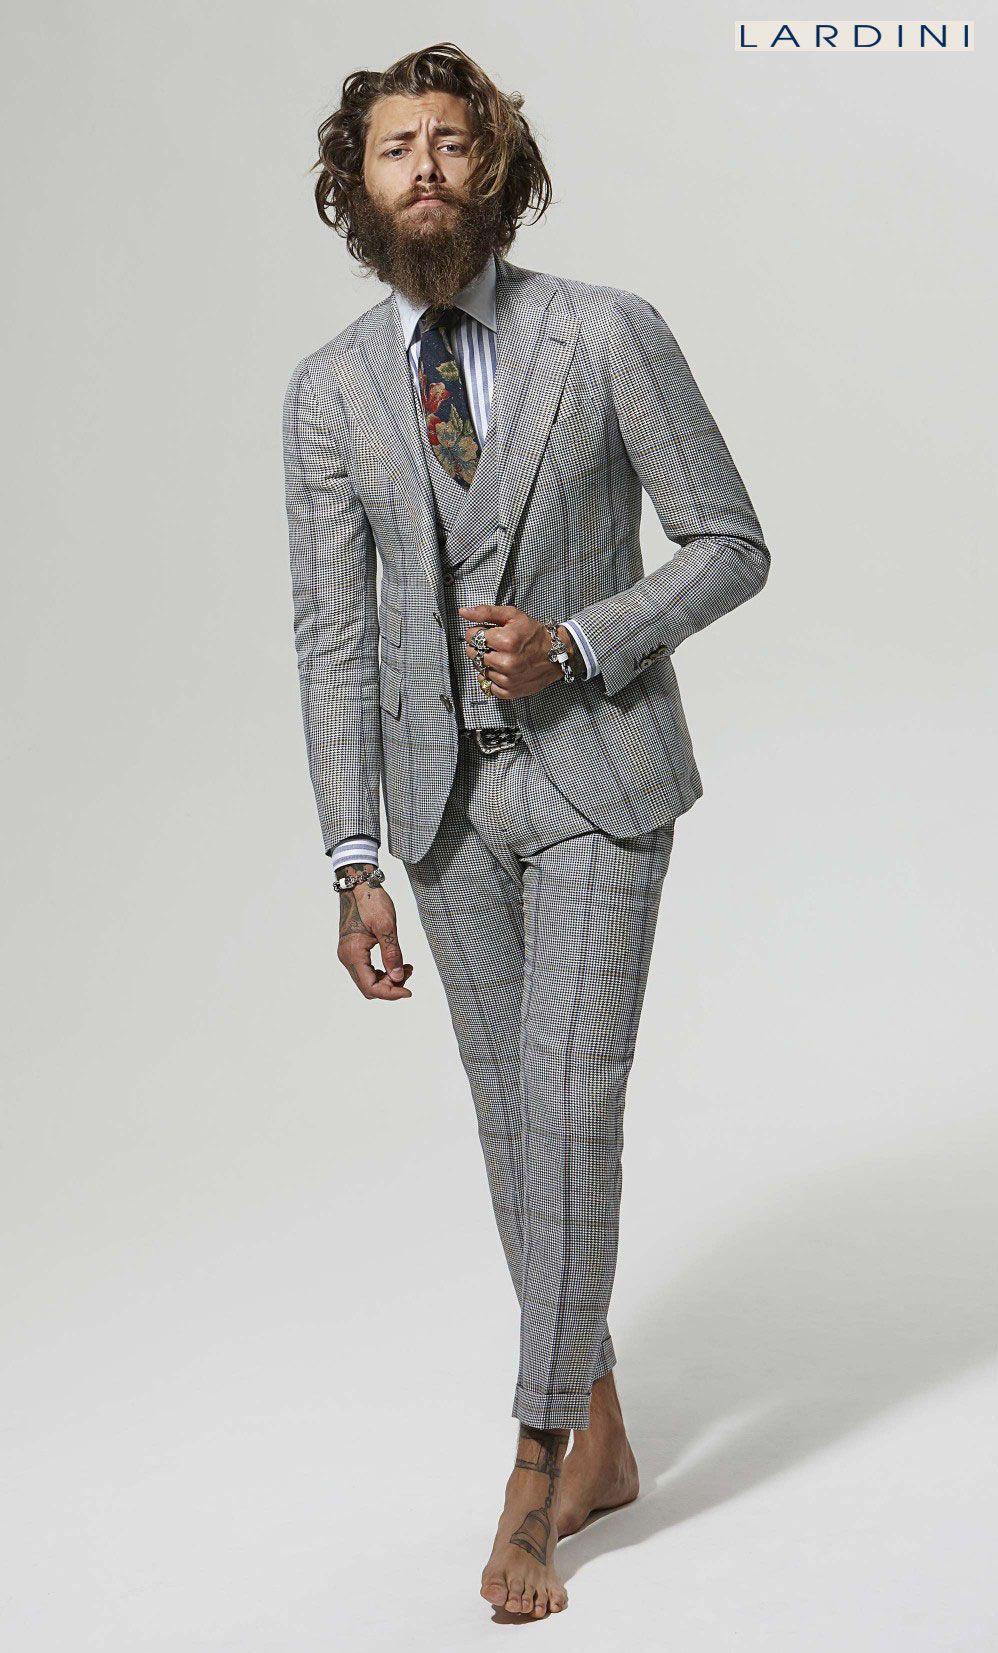 italian style men summer - Google Search | Moda uomo